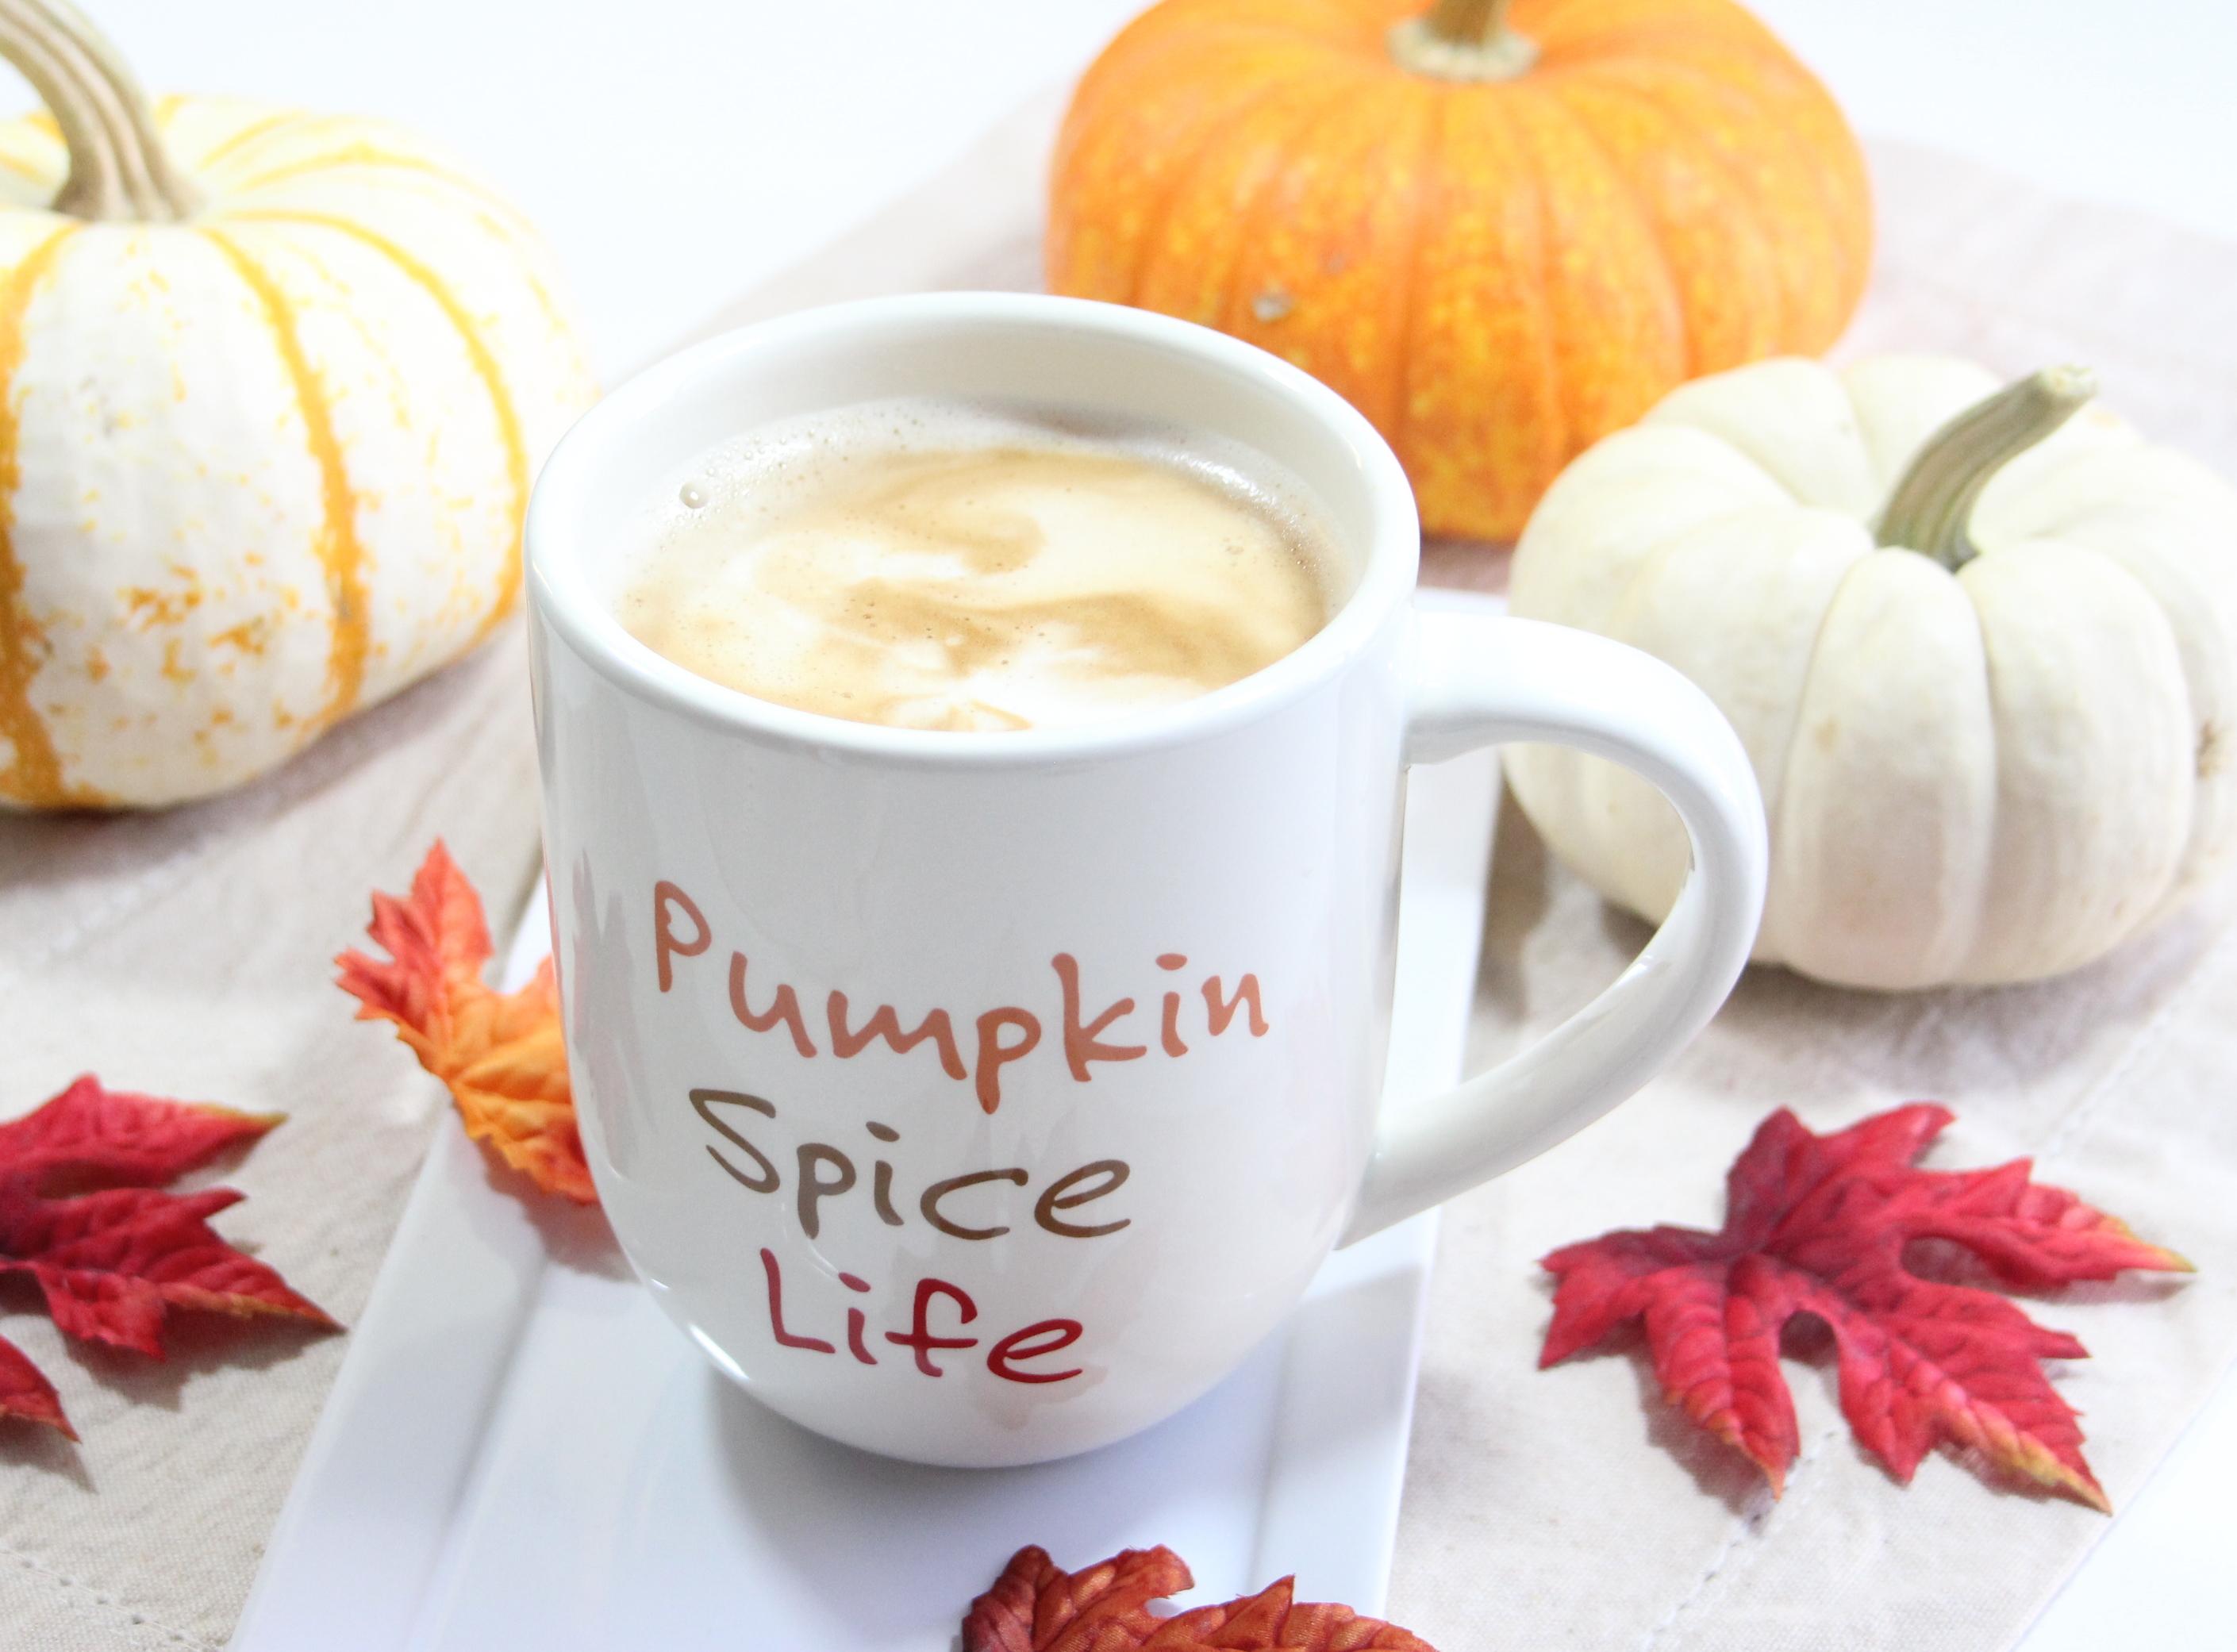 DIY Pumkin Spice Latte